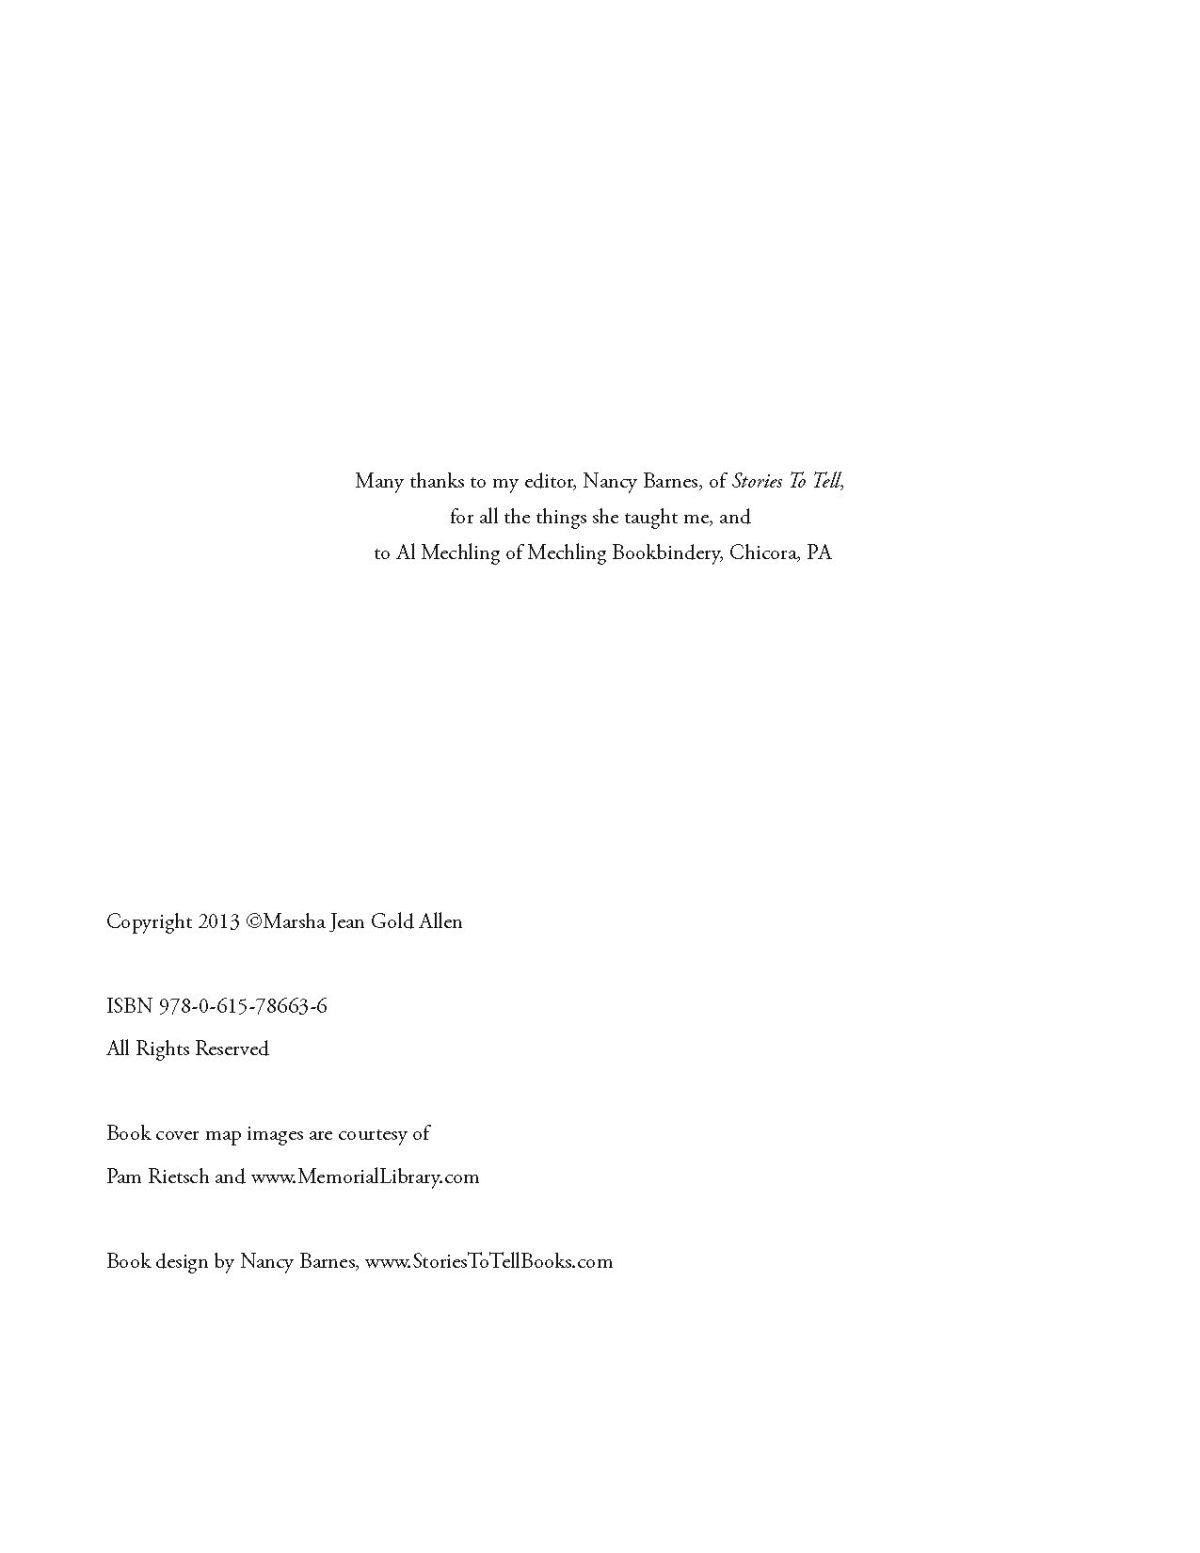 binder1_page_04.jpg